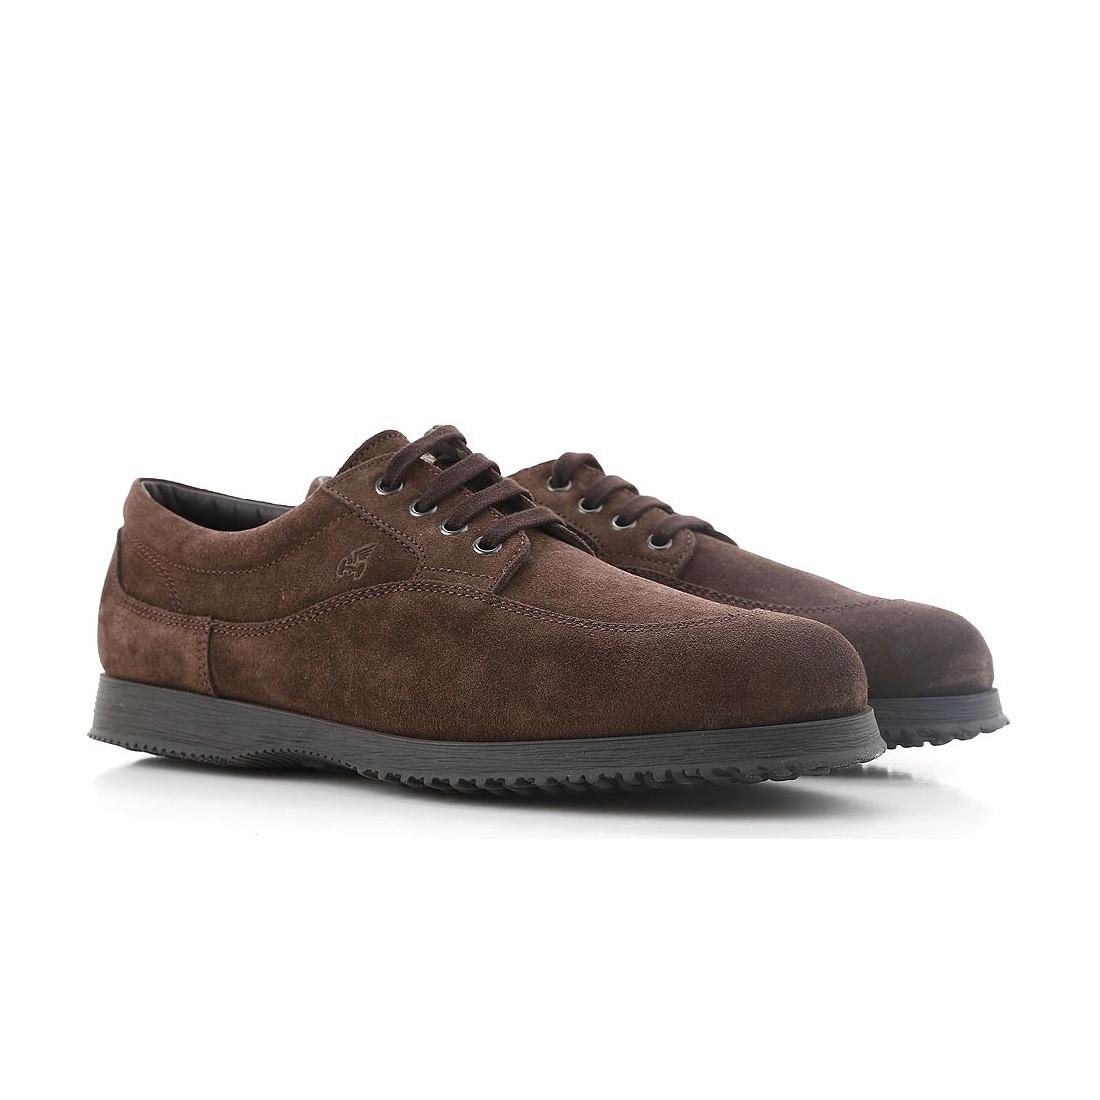 sneakers uomo hogan hxm00e00110hg0s807 4956